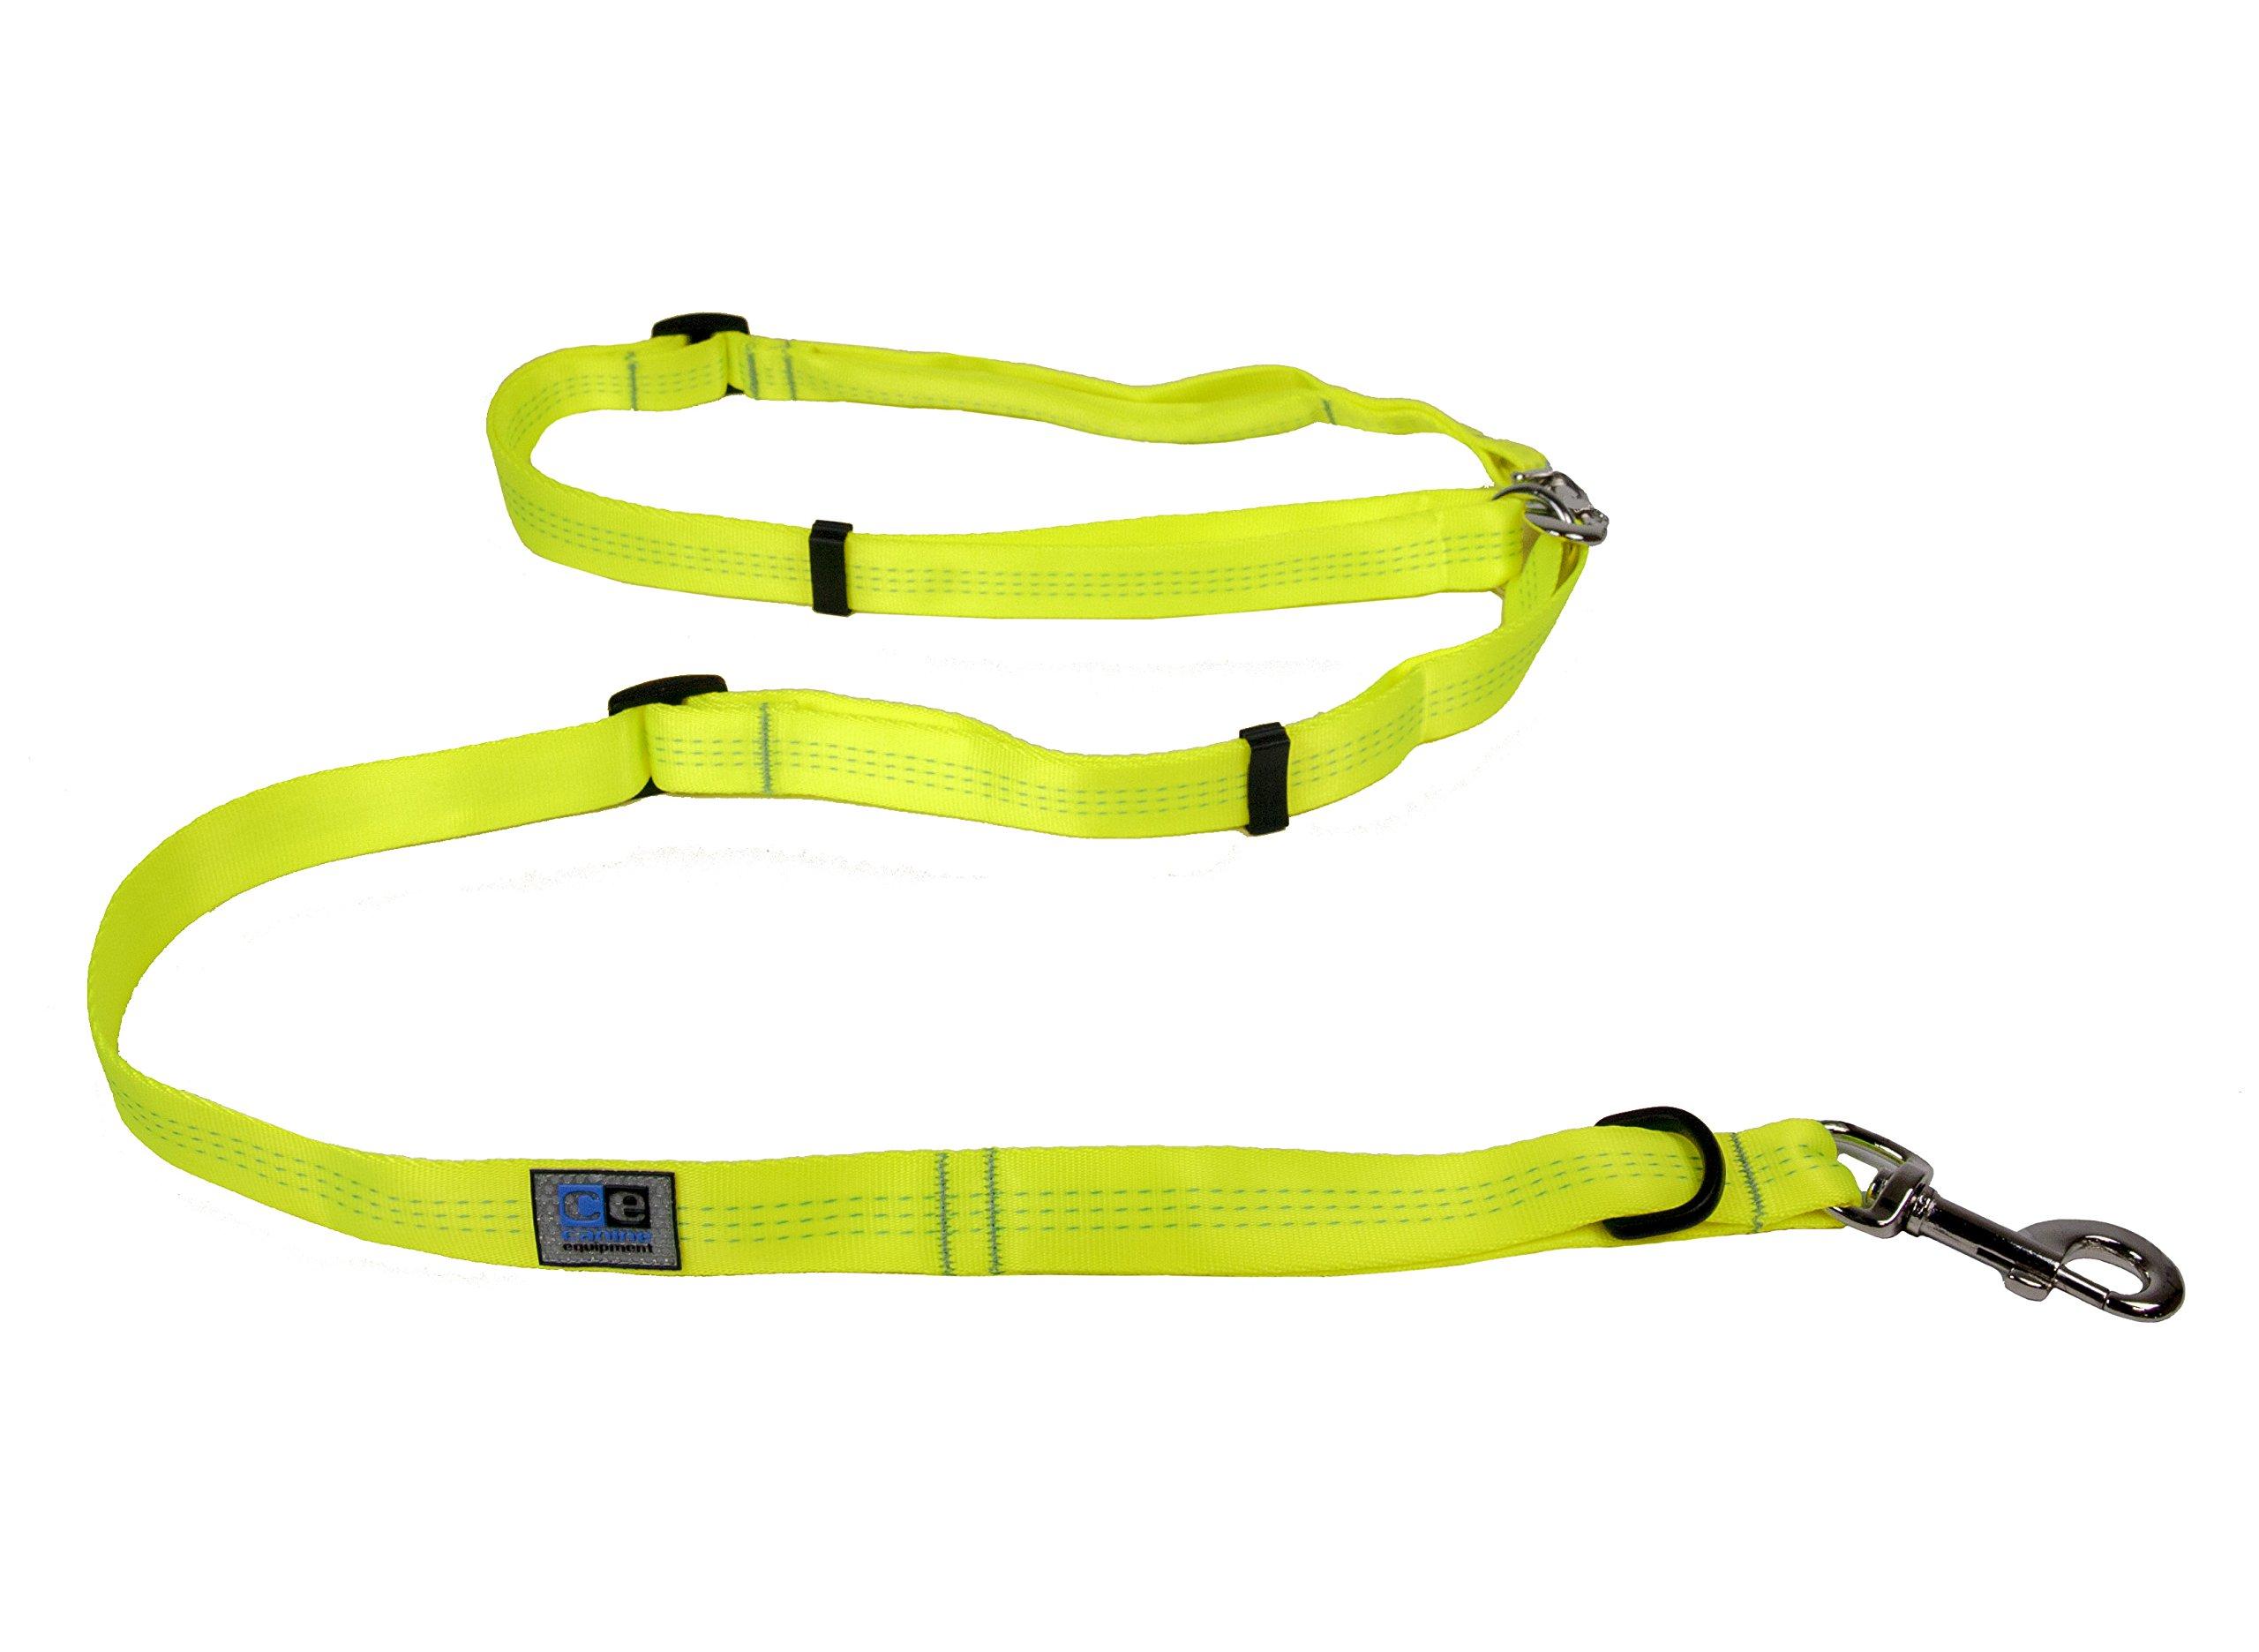 Canine Equipment Technika Beyond Control 1 Inch Dog Leash, 4 in 1 Leash, Neon Yellow